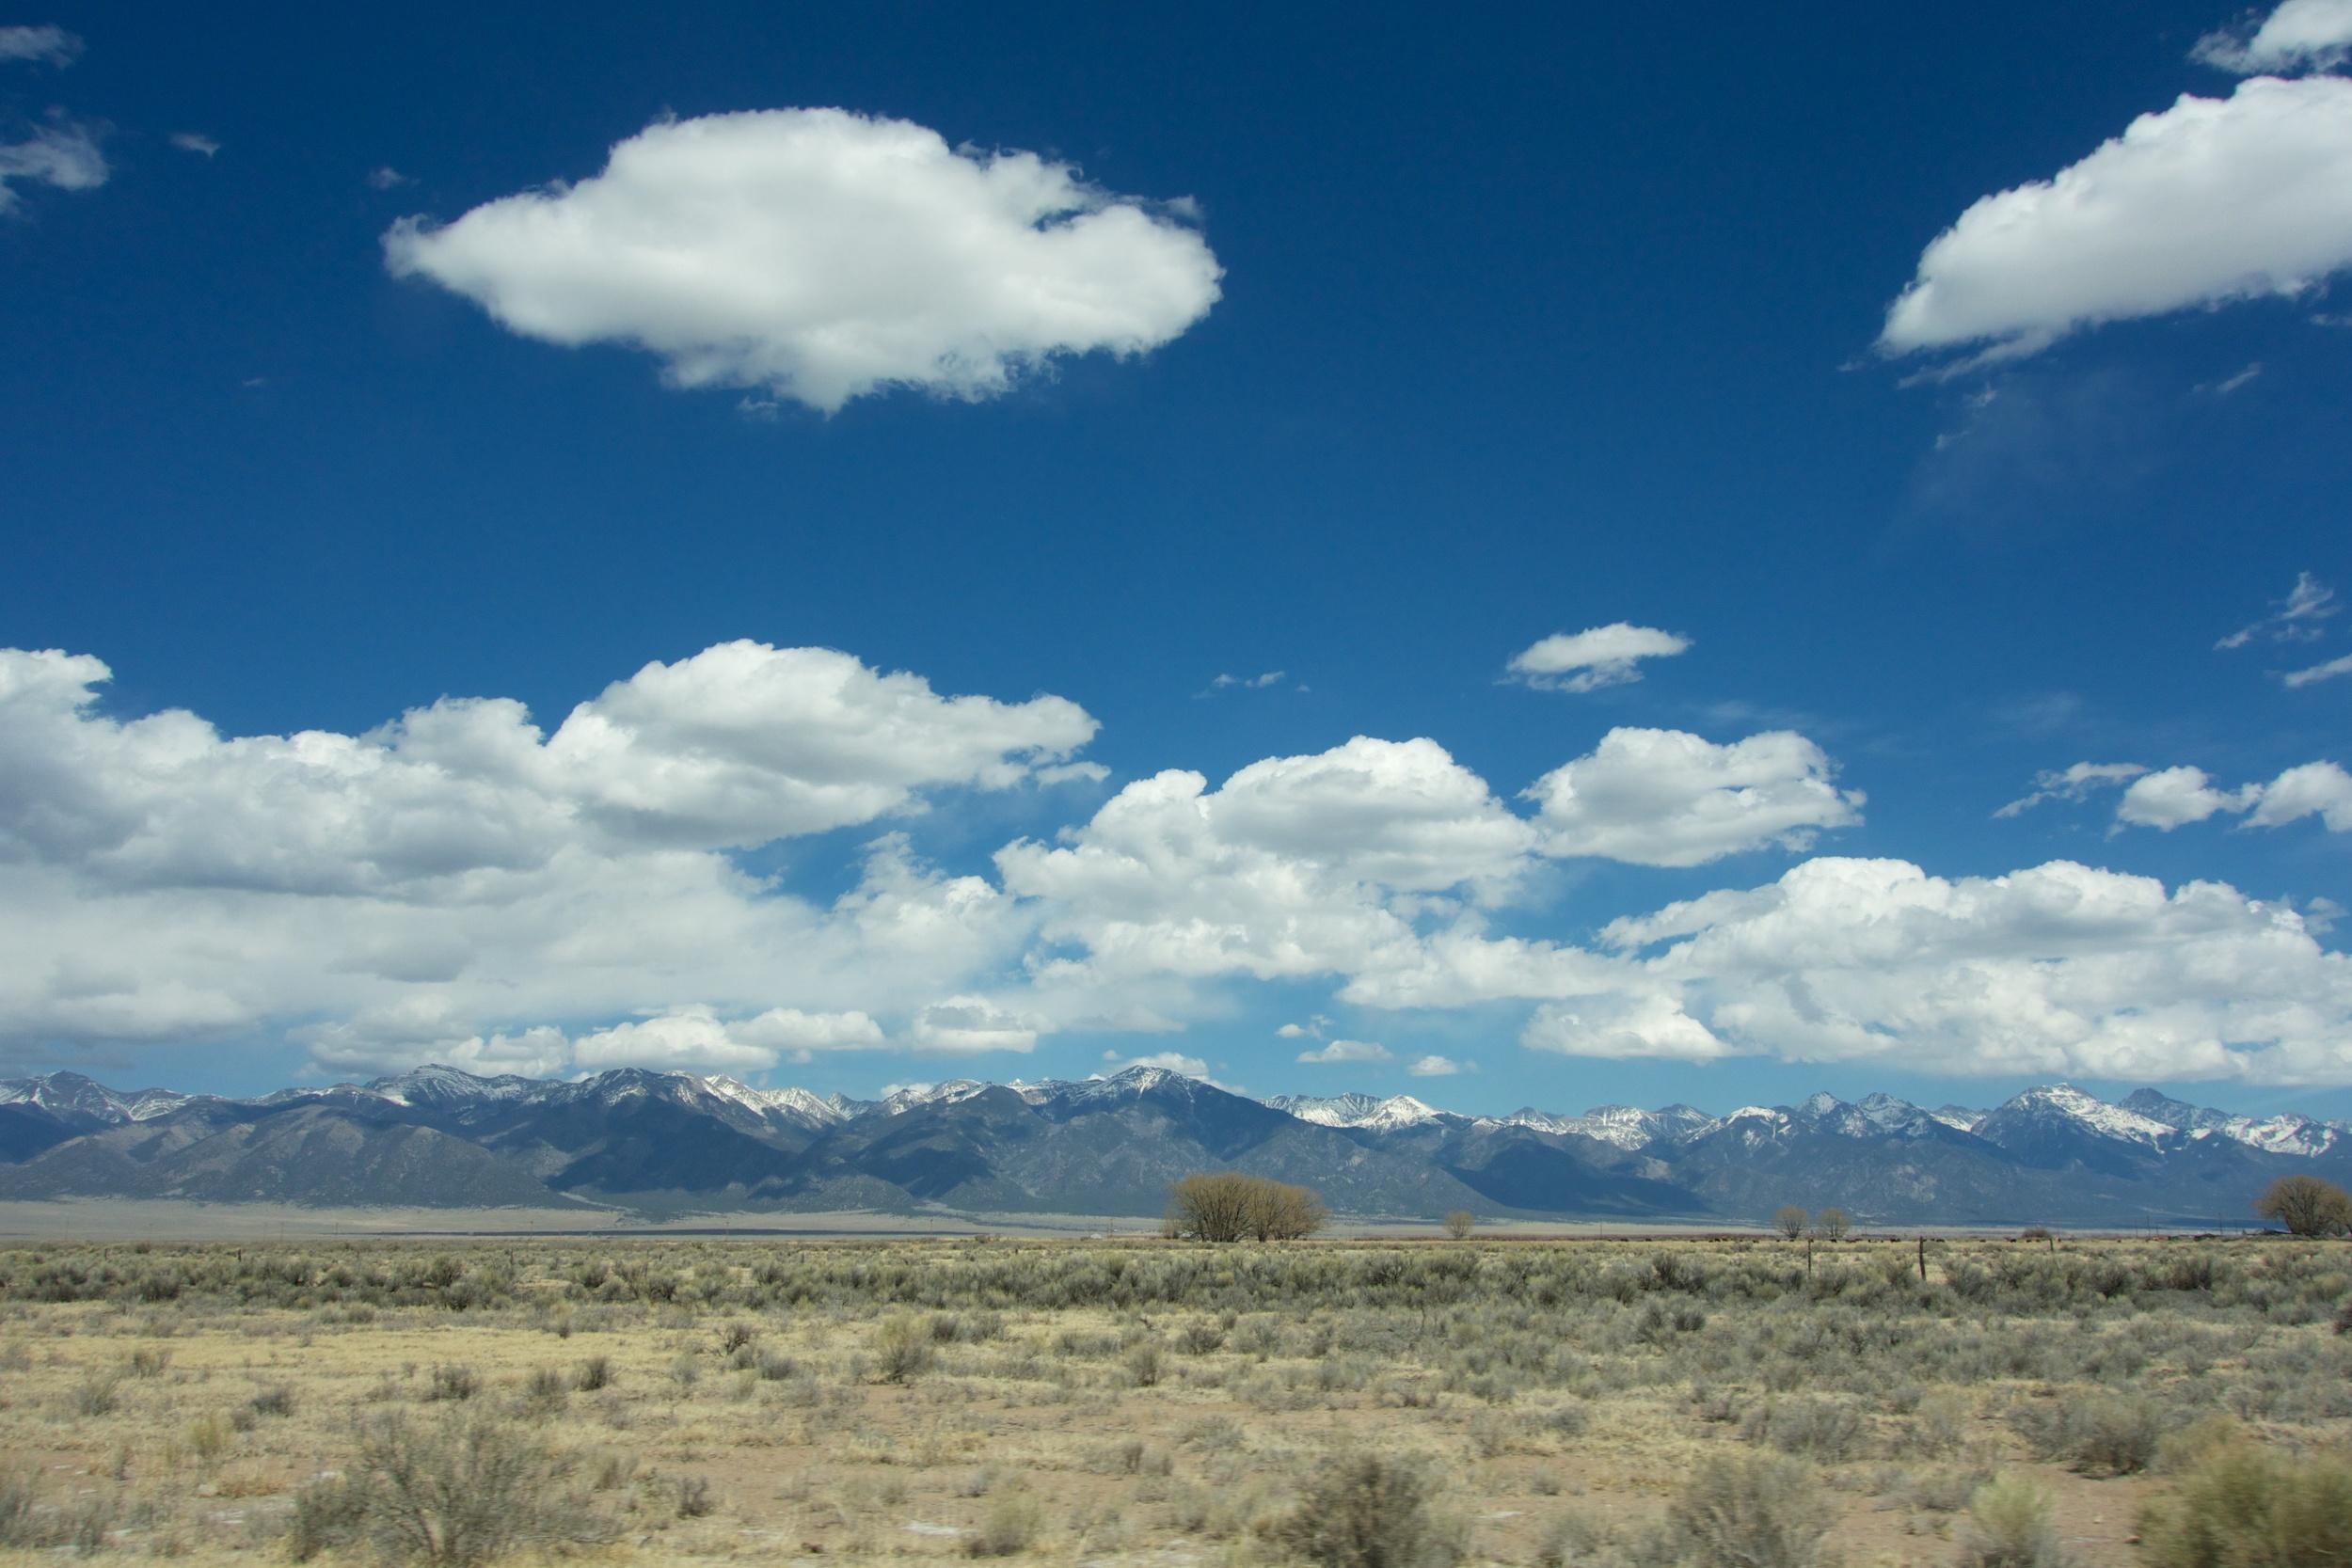 The Sangre de Cristos mountains, southbound US 285, 4 May